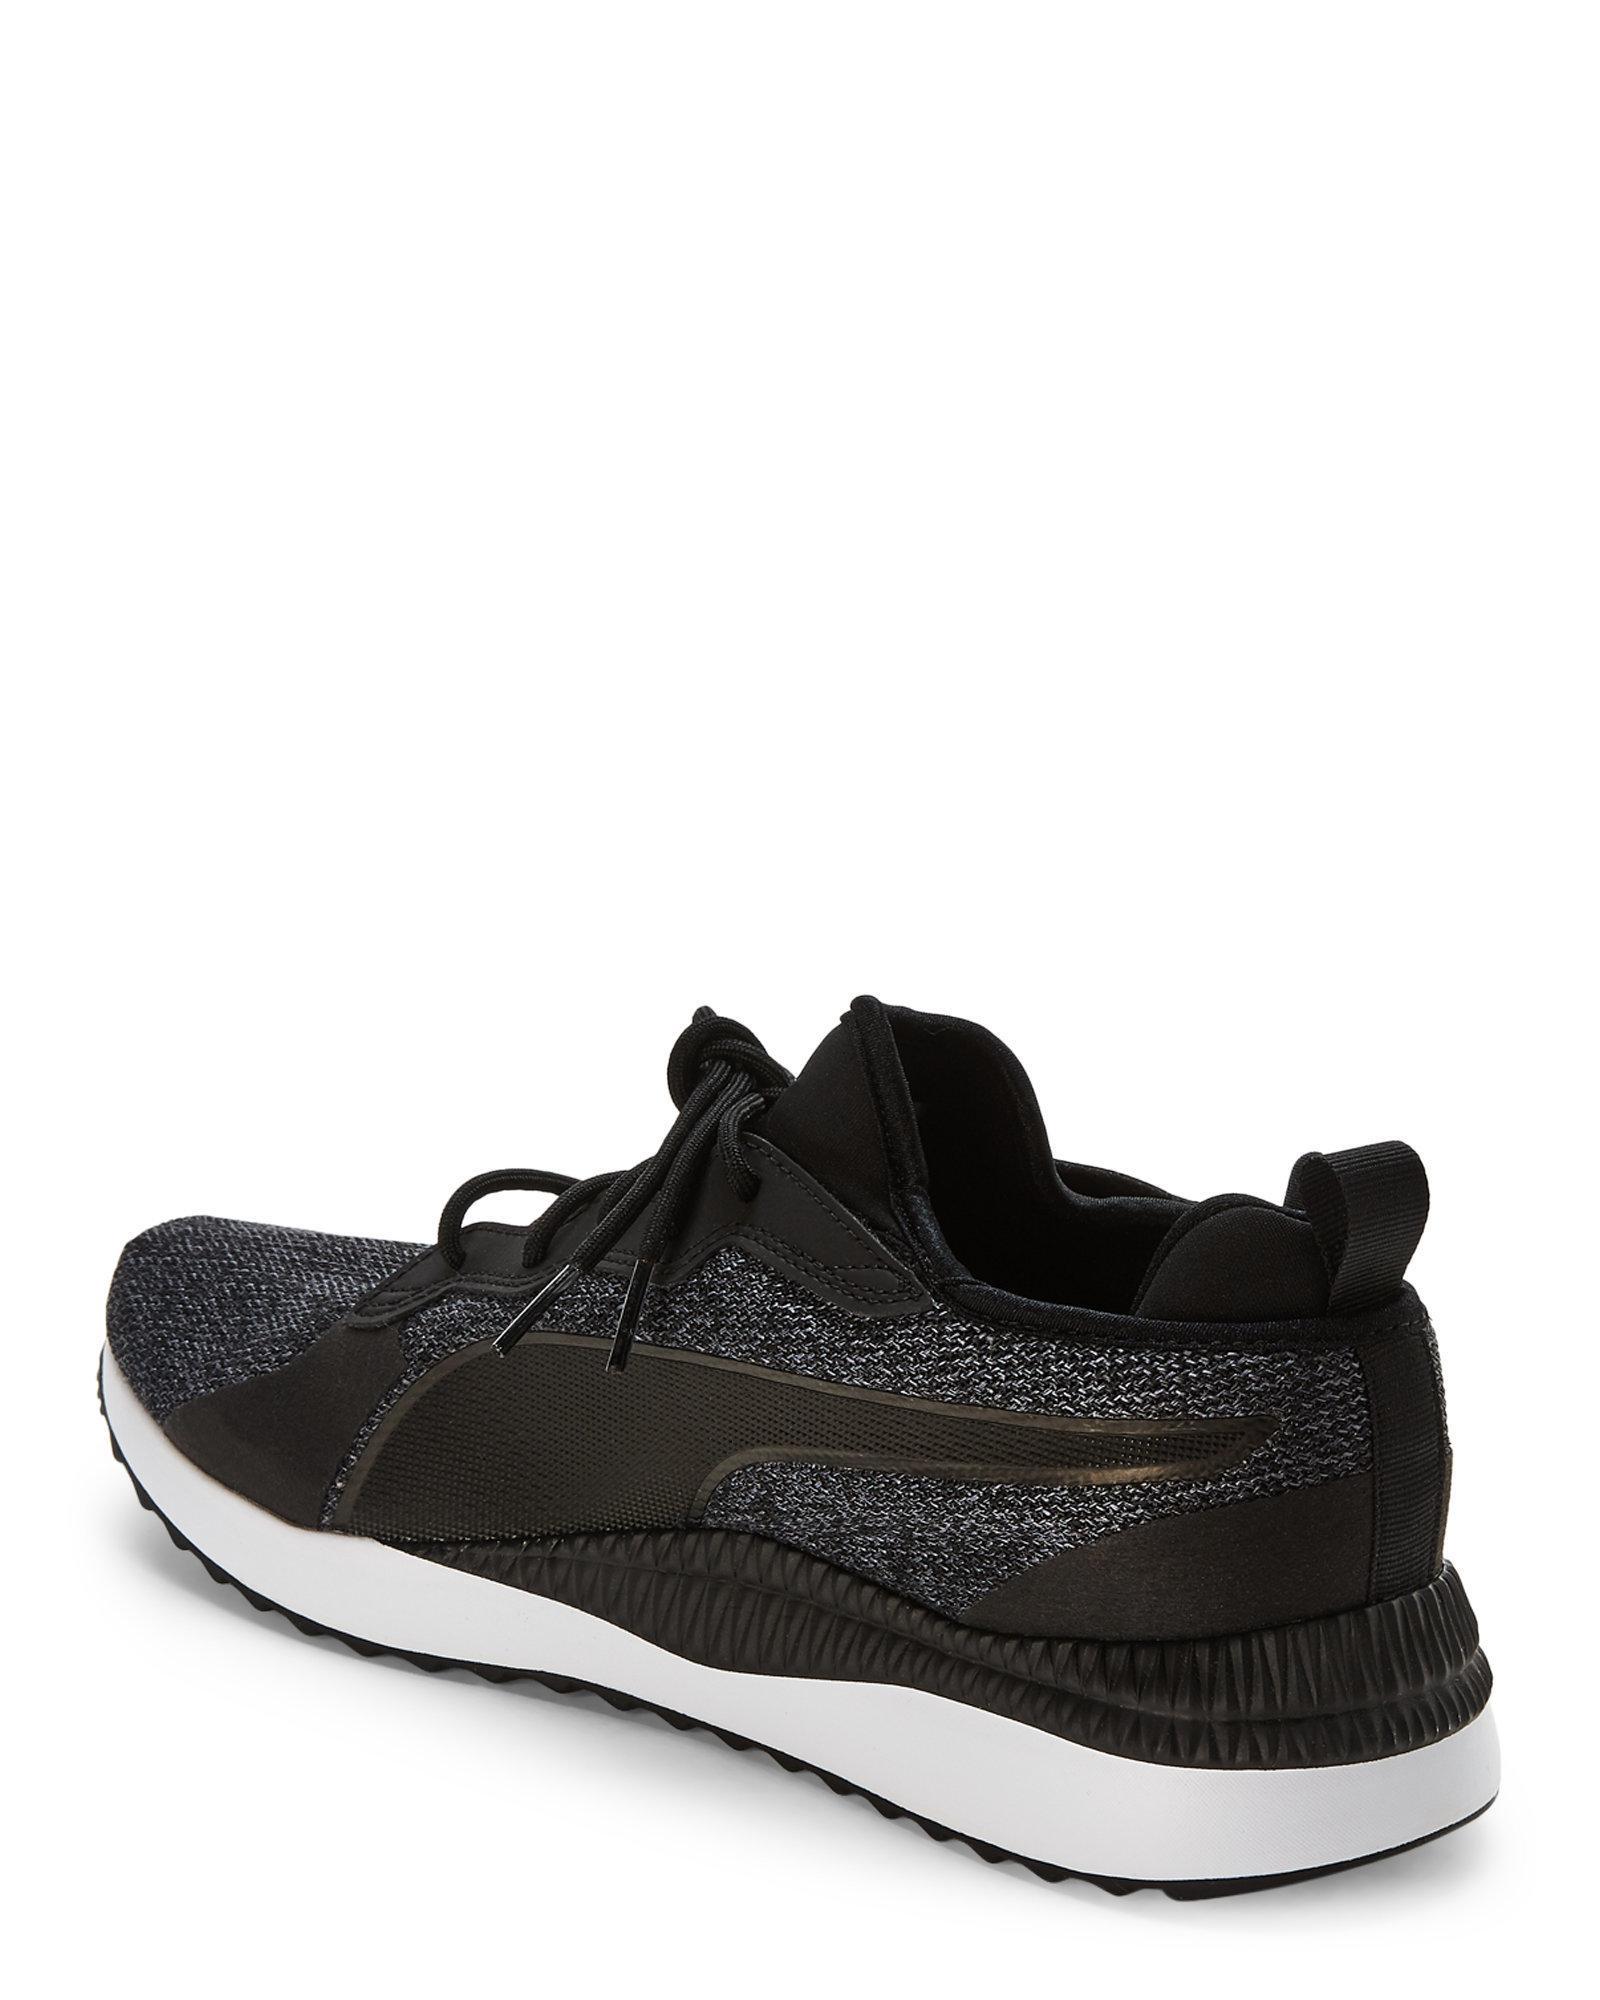 Lyst - PUMA Black   Grey Pacer Next Tw Knit Sneakers in Black for Men 4fd220cbf